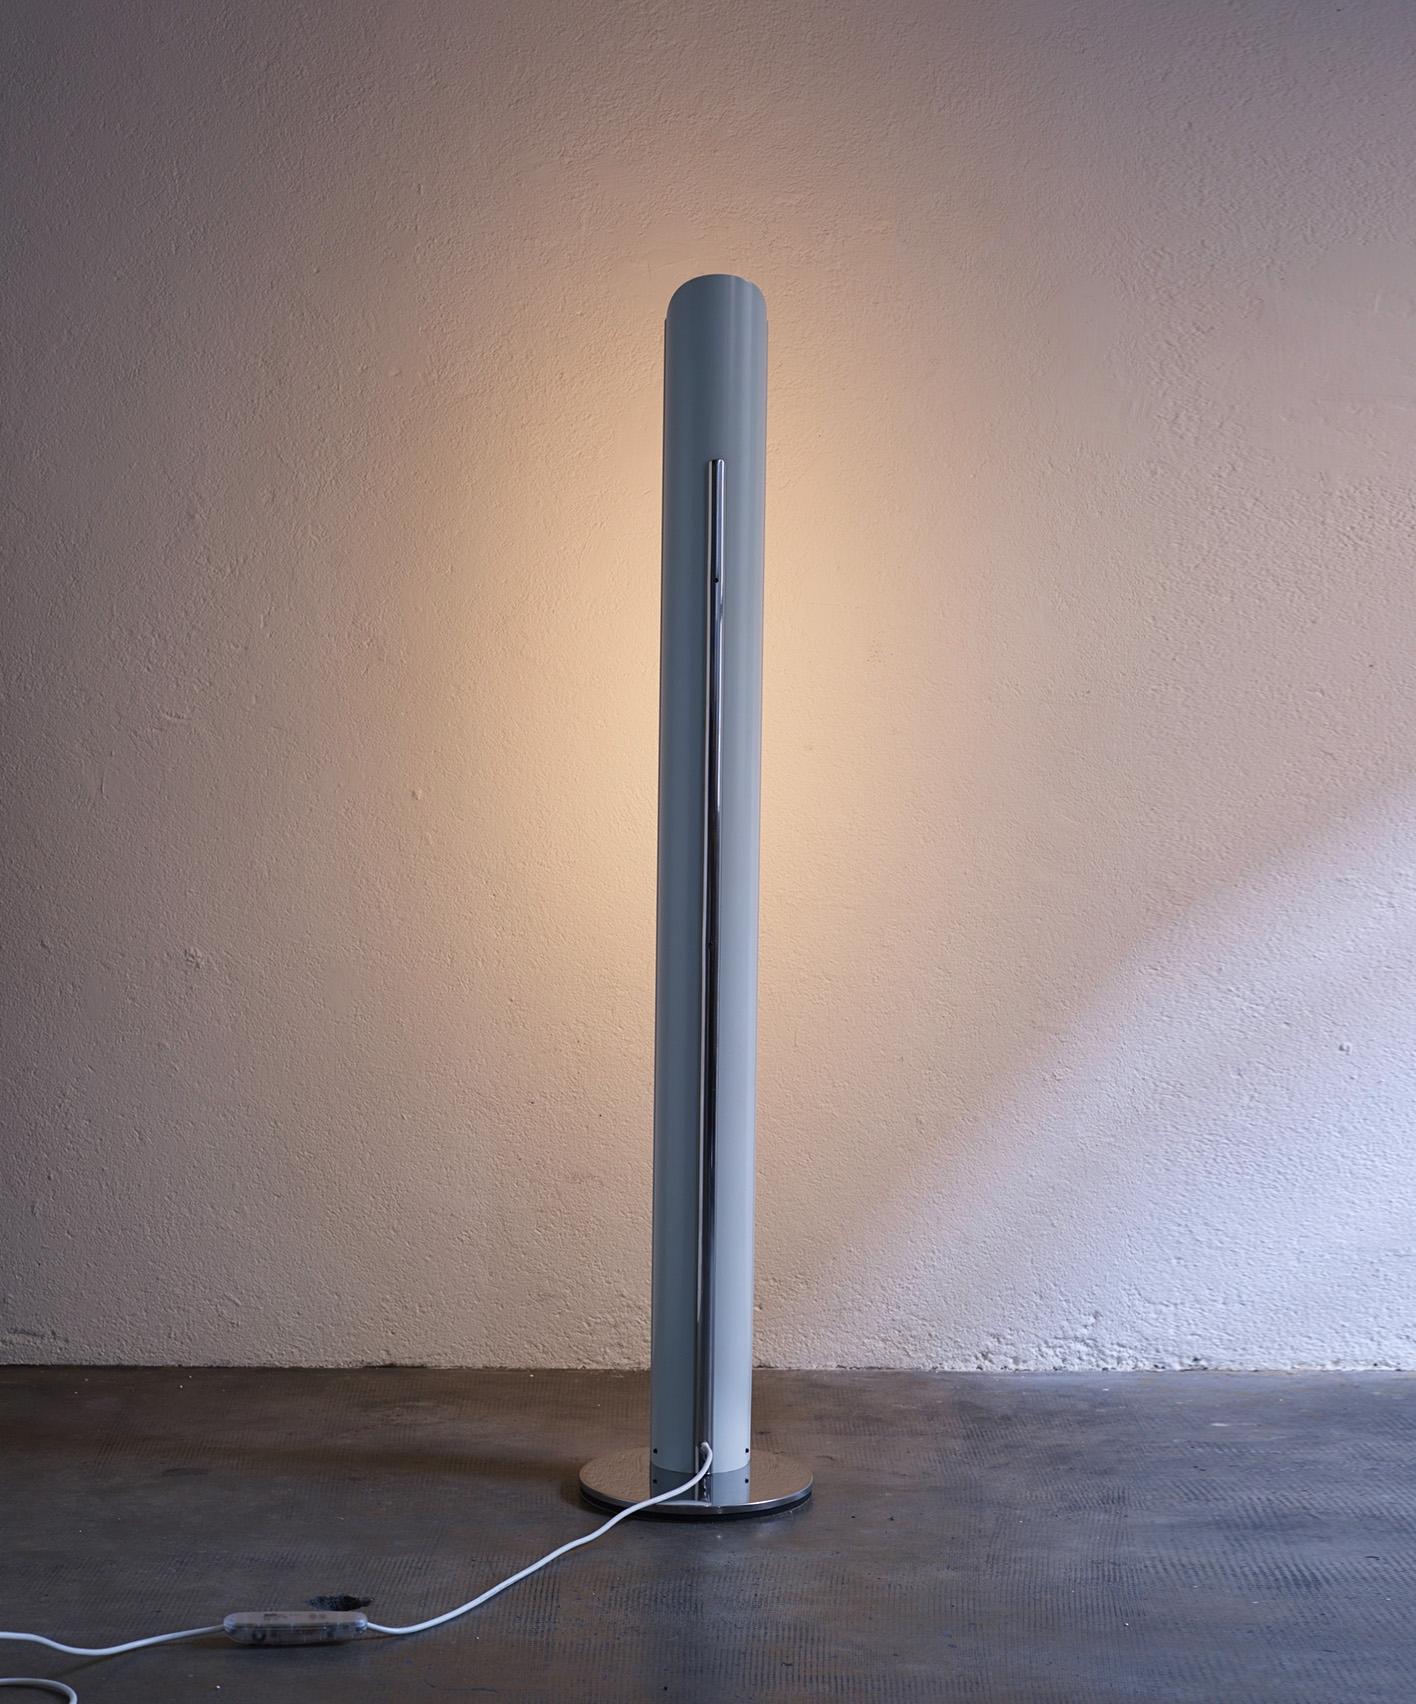 italian-floor-lamp-by-enrico-tronconi-1970-image-02